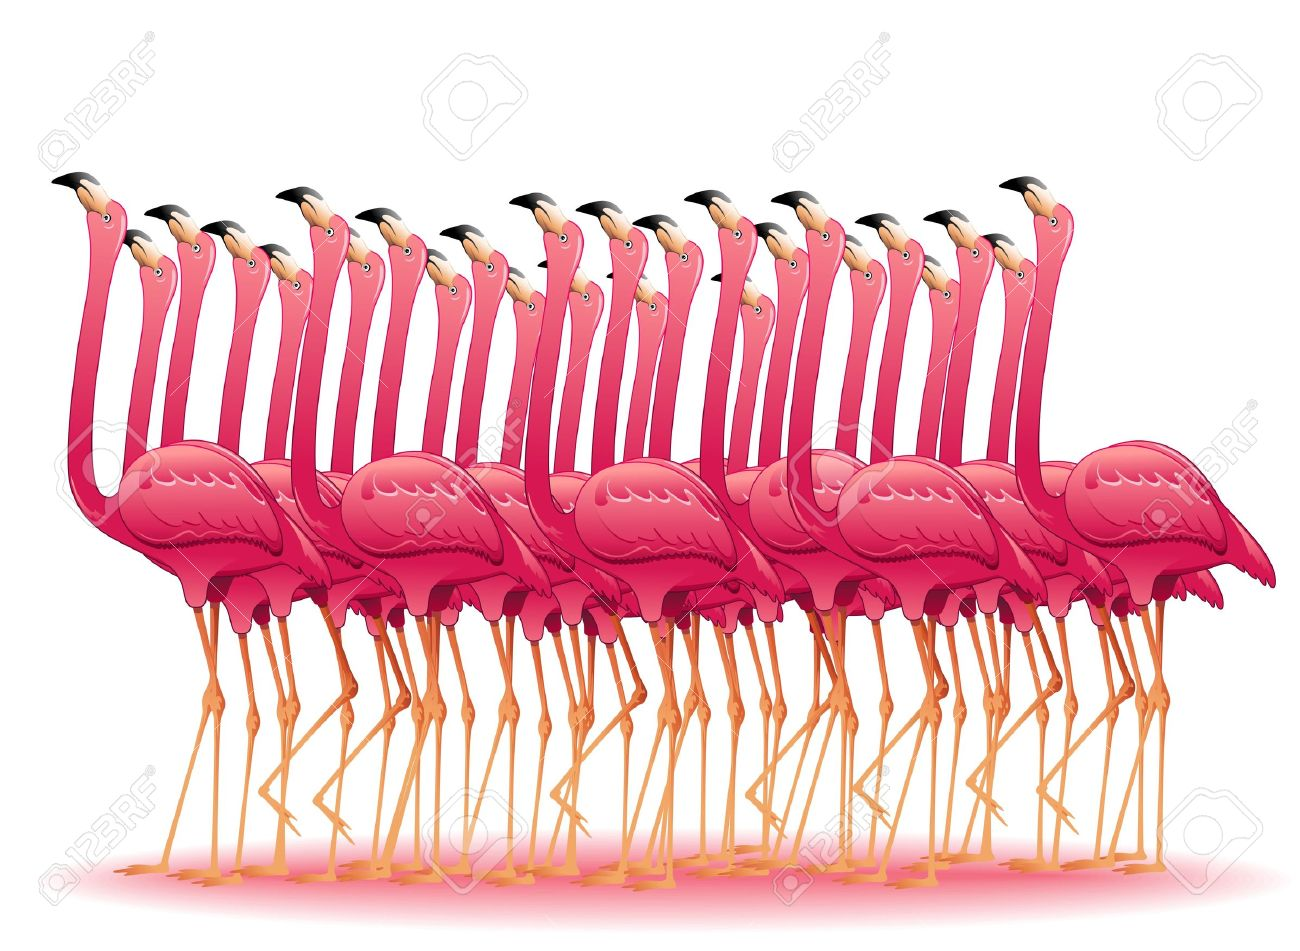 Pink Flamingos Group Stock Vector - 19136428